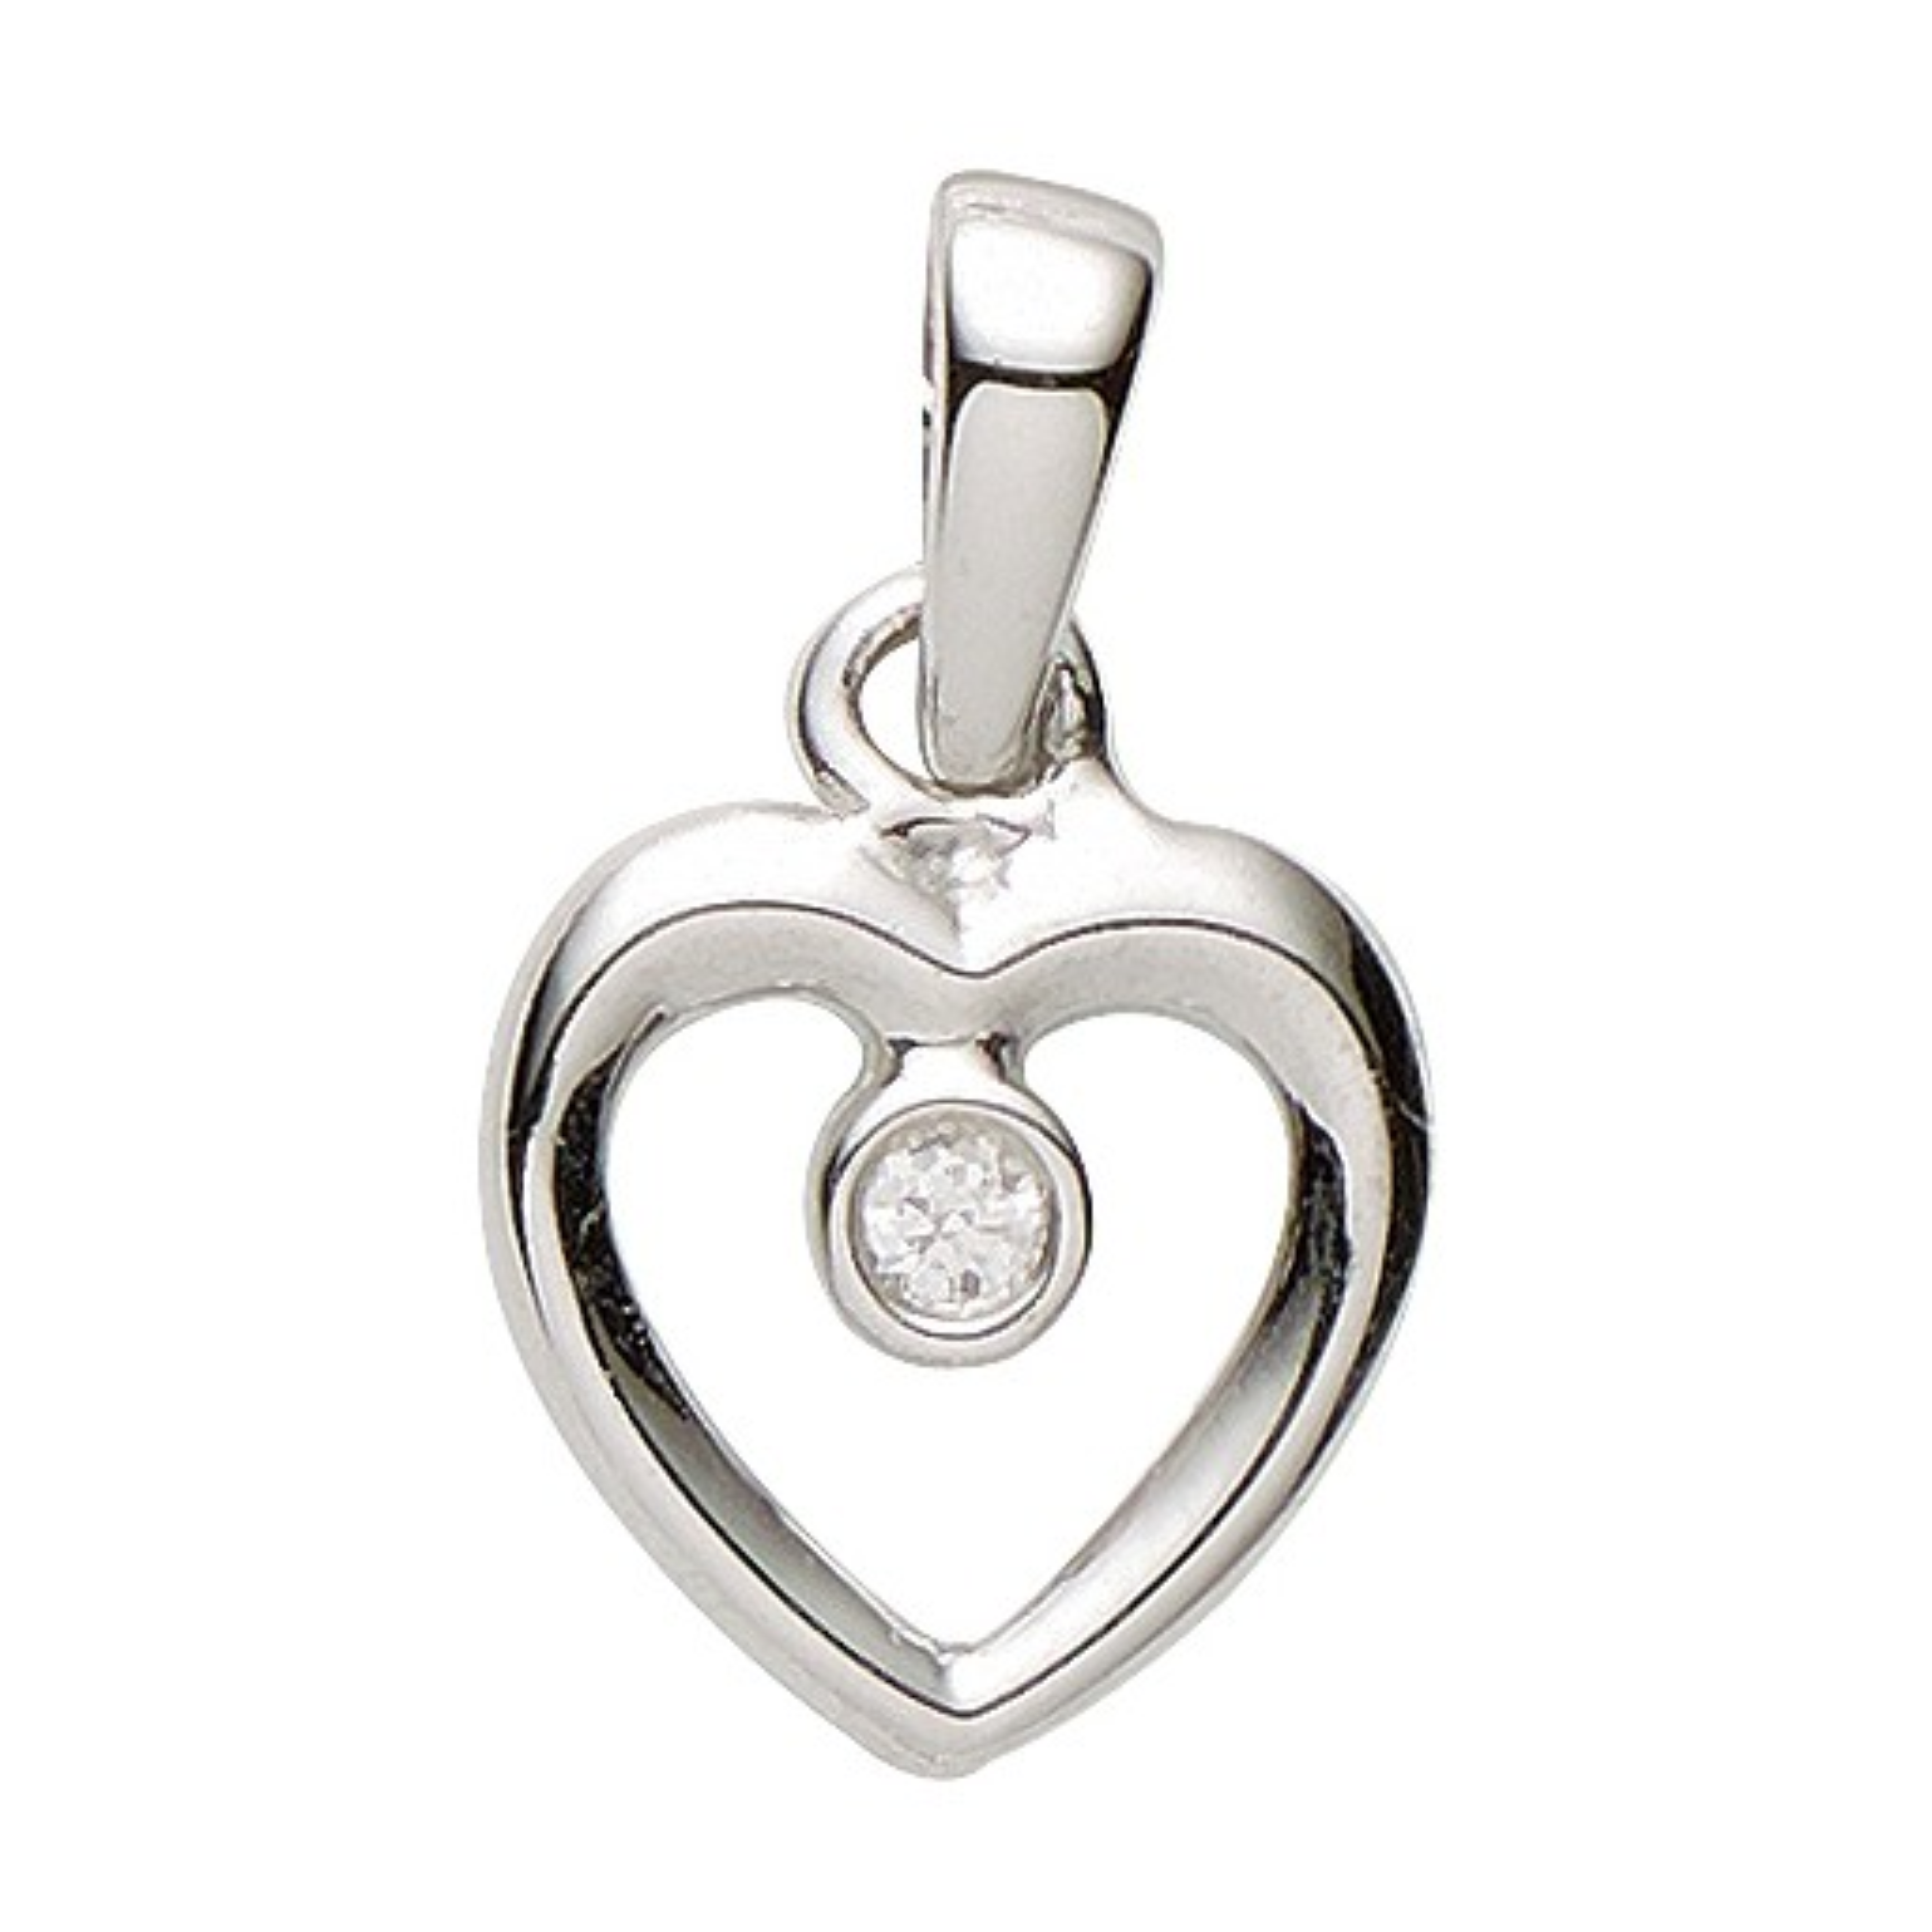 Basic Silber 21.1147S Damen Anhänger Herz Silber Zirkonia weiß